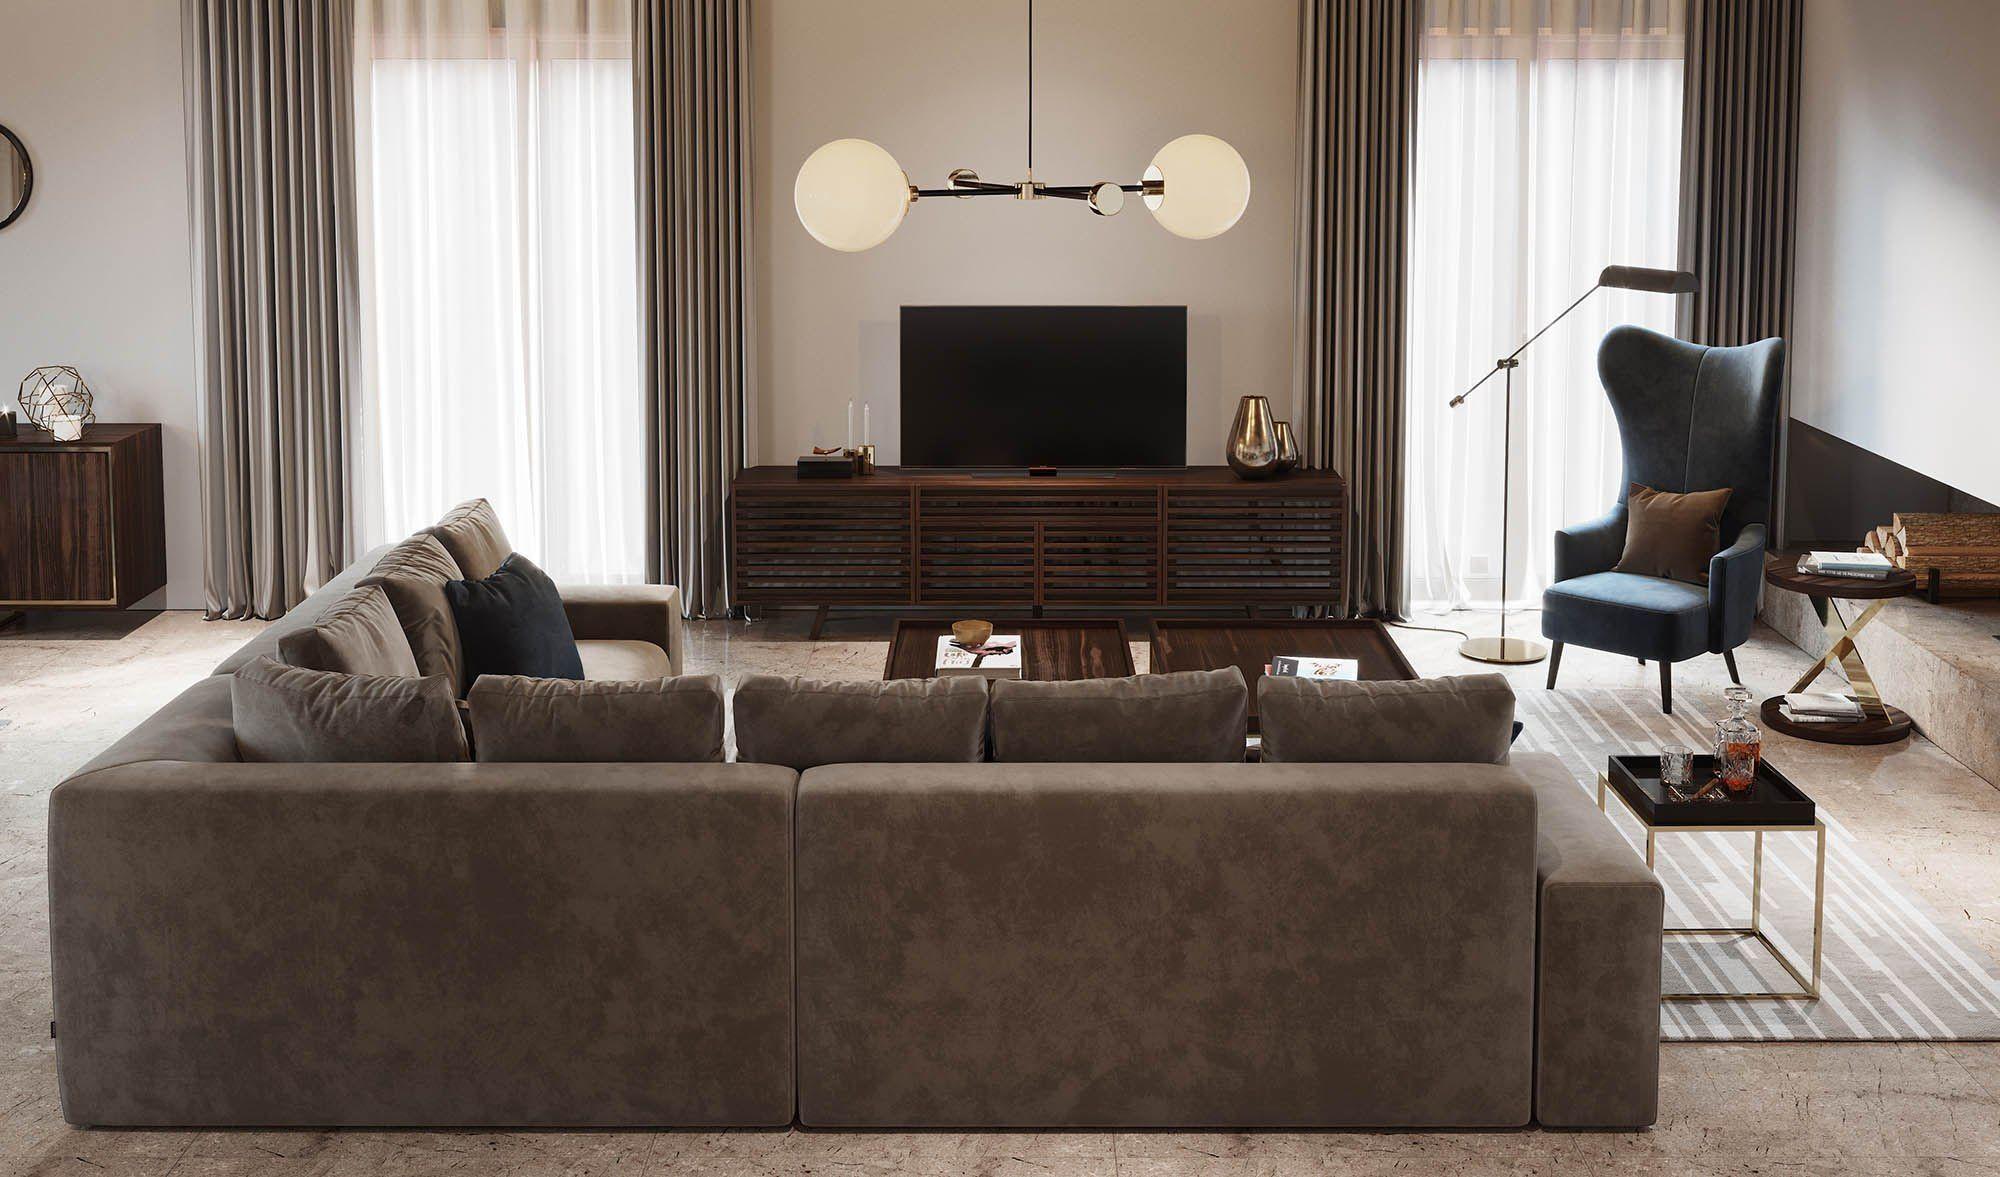 Laskasas Decorate Life Living Room Ideas Taupe Sofa Wood